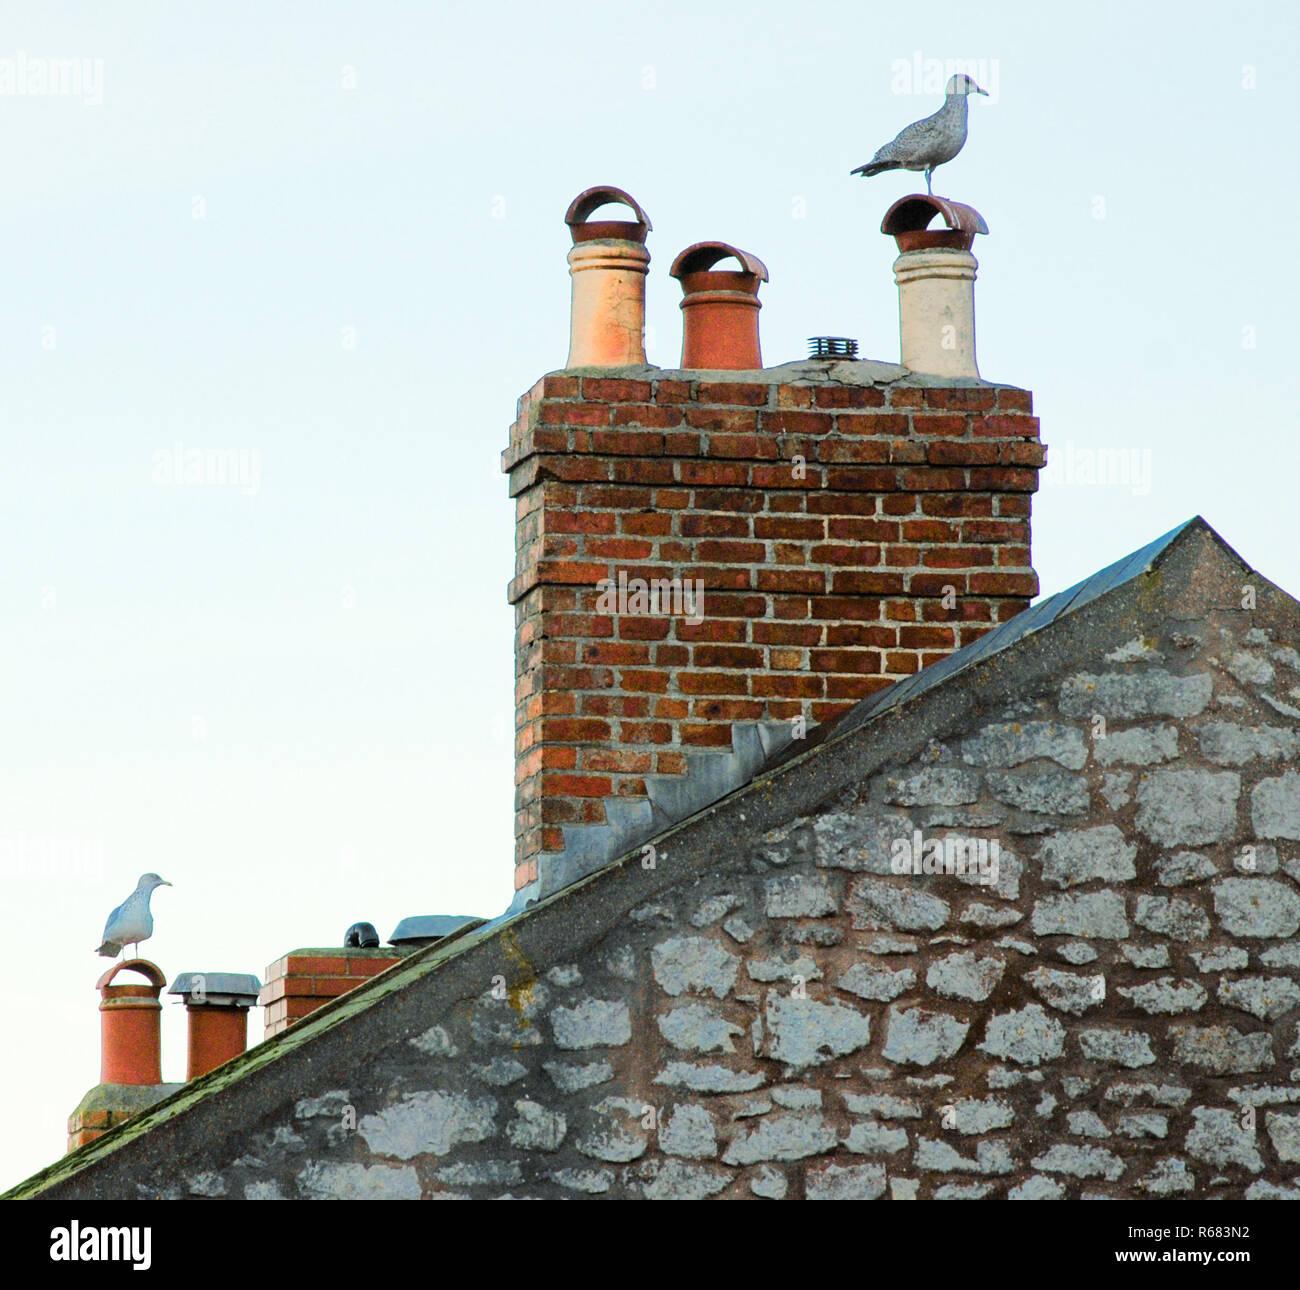 Portland, Dorset, UK. 4th December 2018. Seagulls rest on rooftops in Fotuneswell, Isle of Portand Credit: stuart fretwell/Alamy Live News Stock Photo